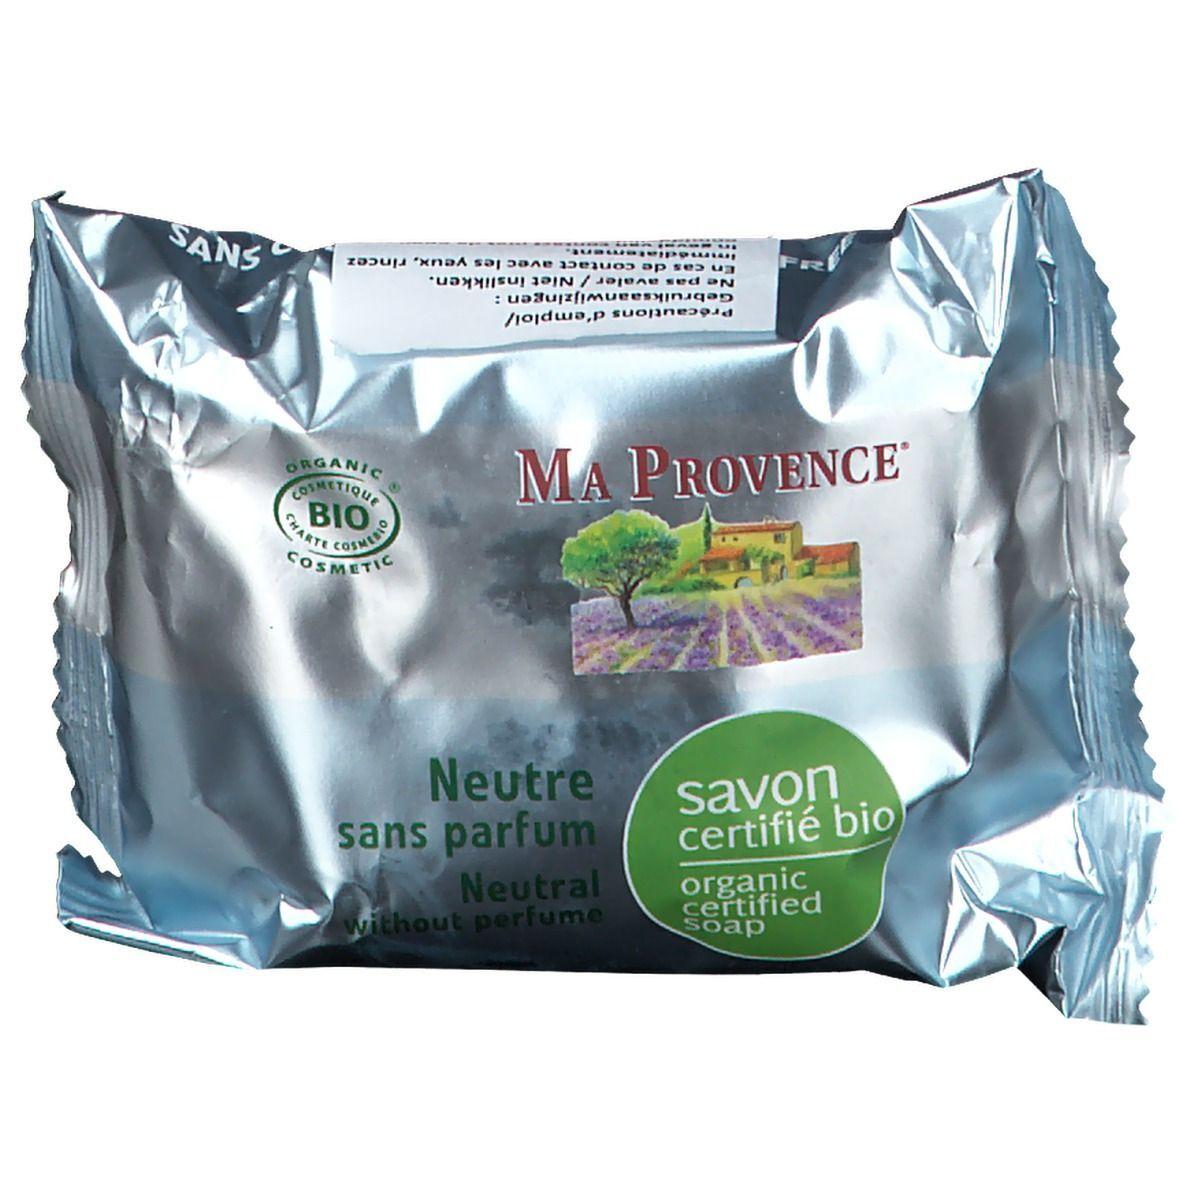 Ma Provence® Ma Provence Savon bio Neutre sans parfum g savon